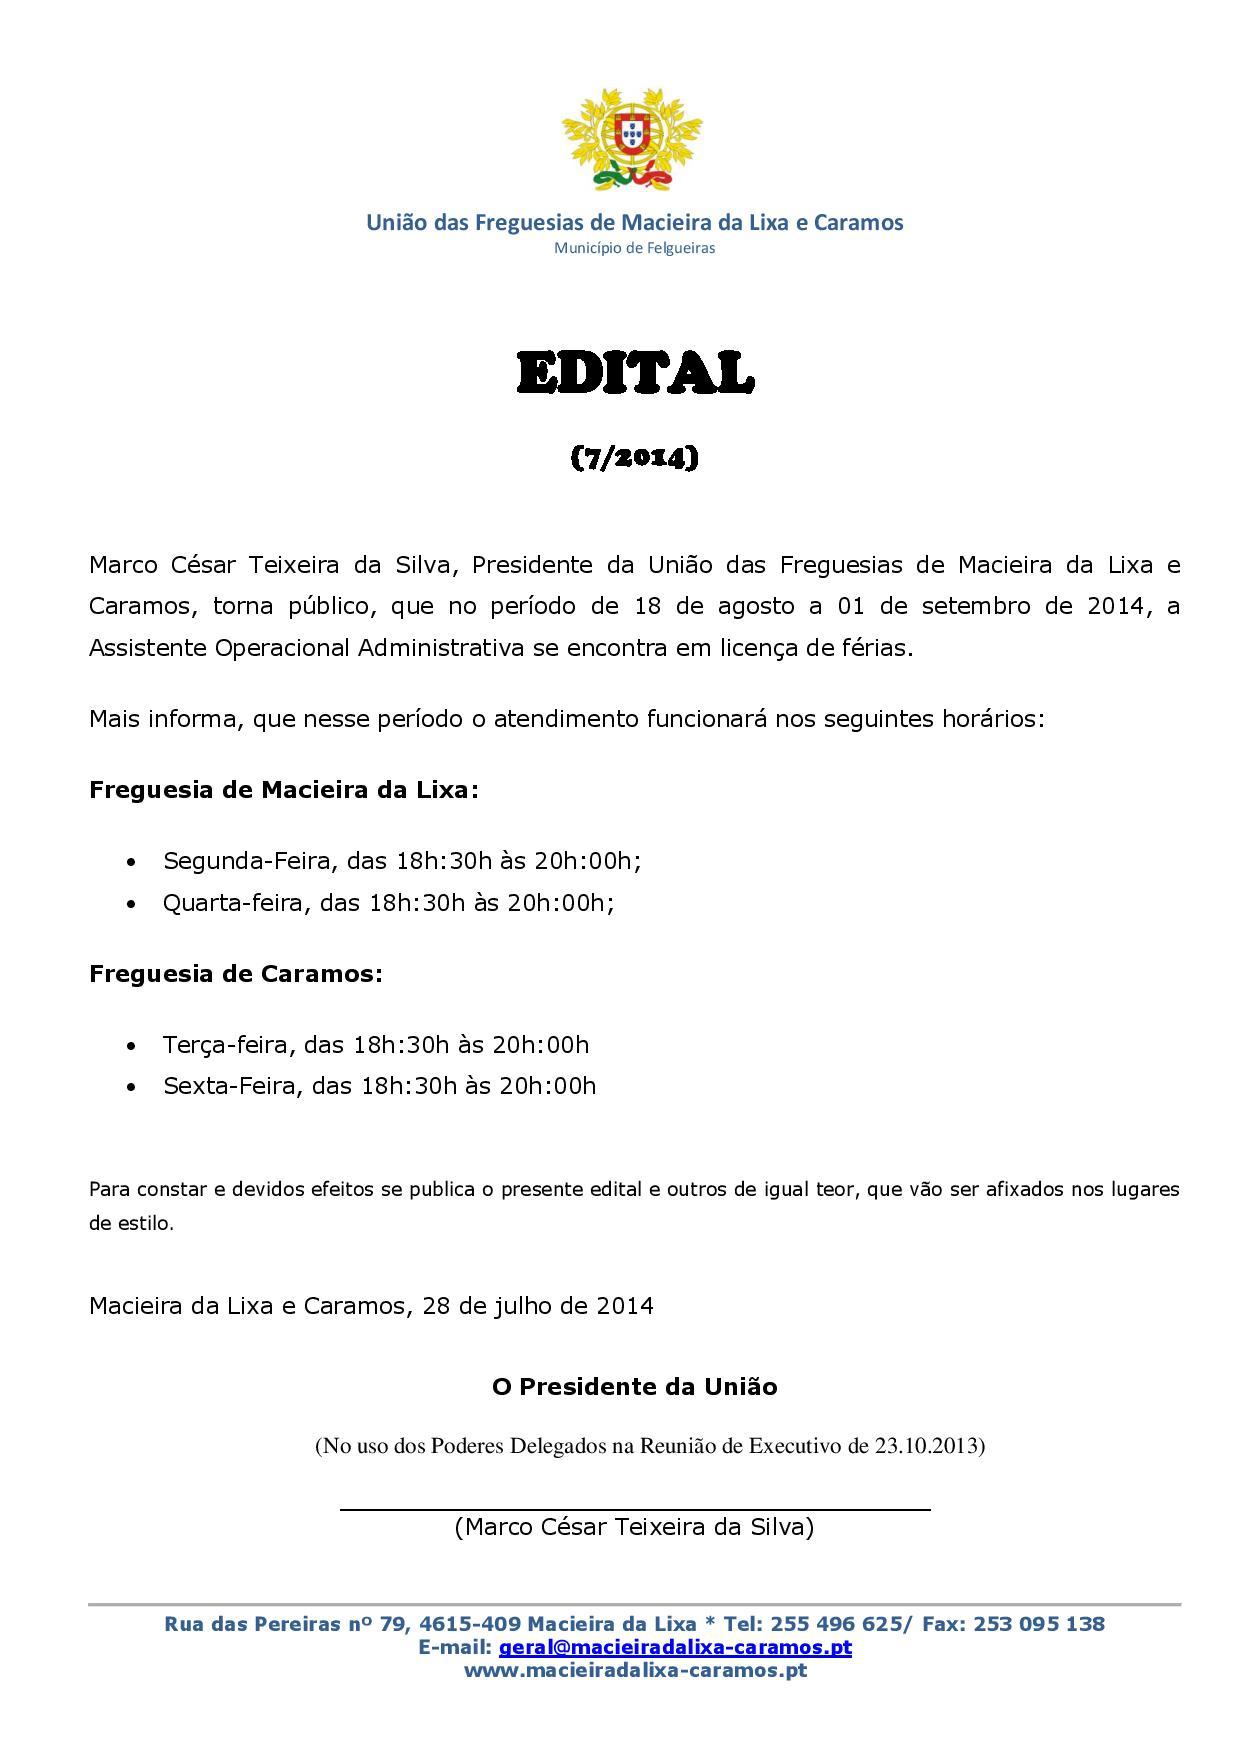 Edital _7_2014-page-001